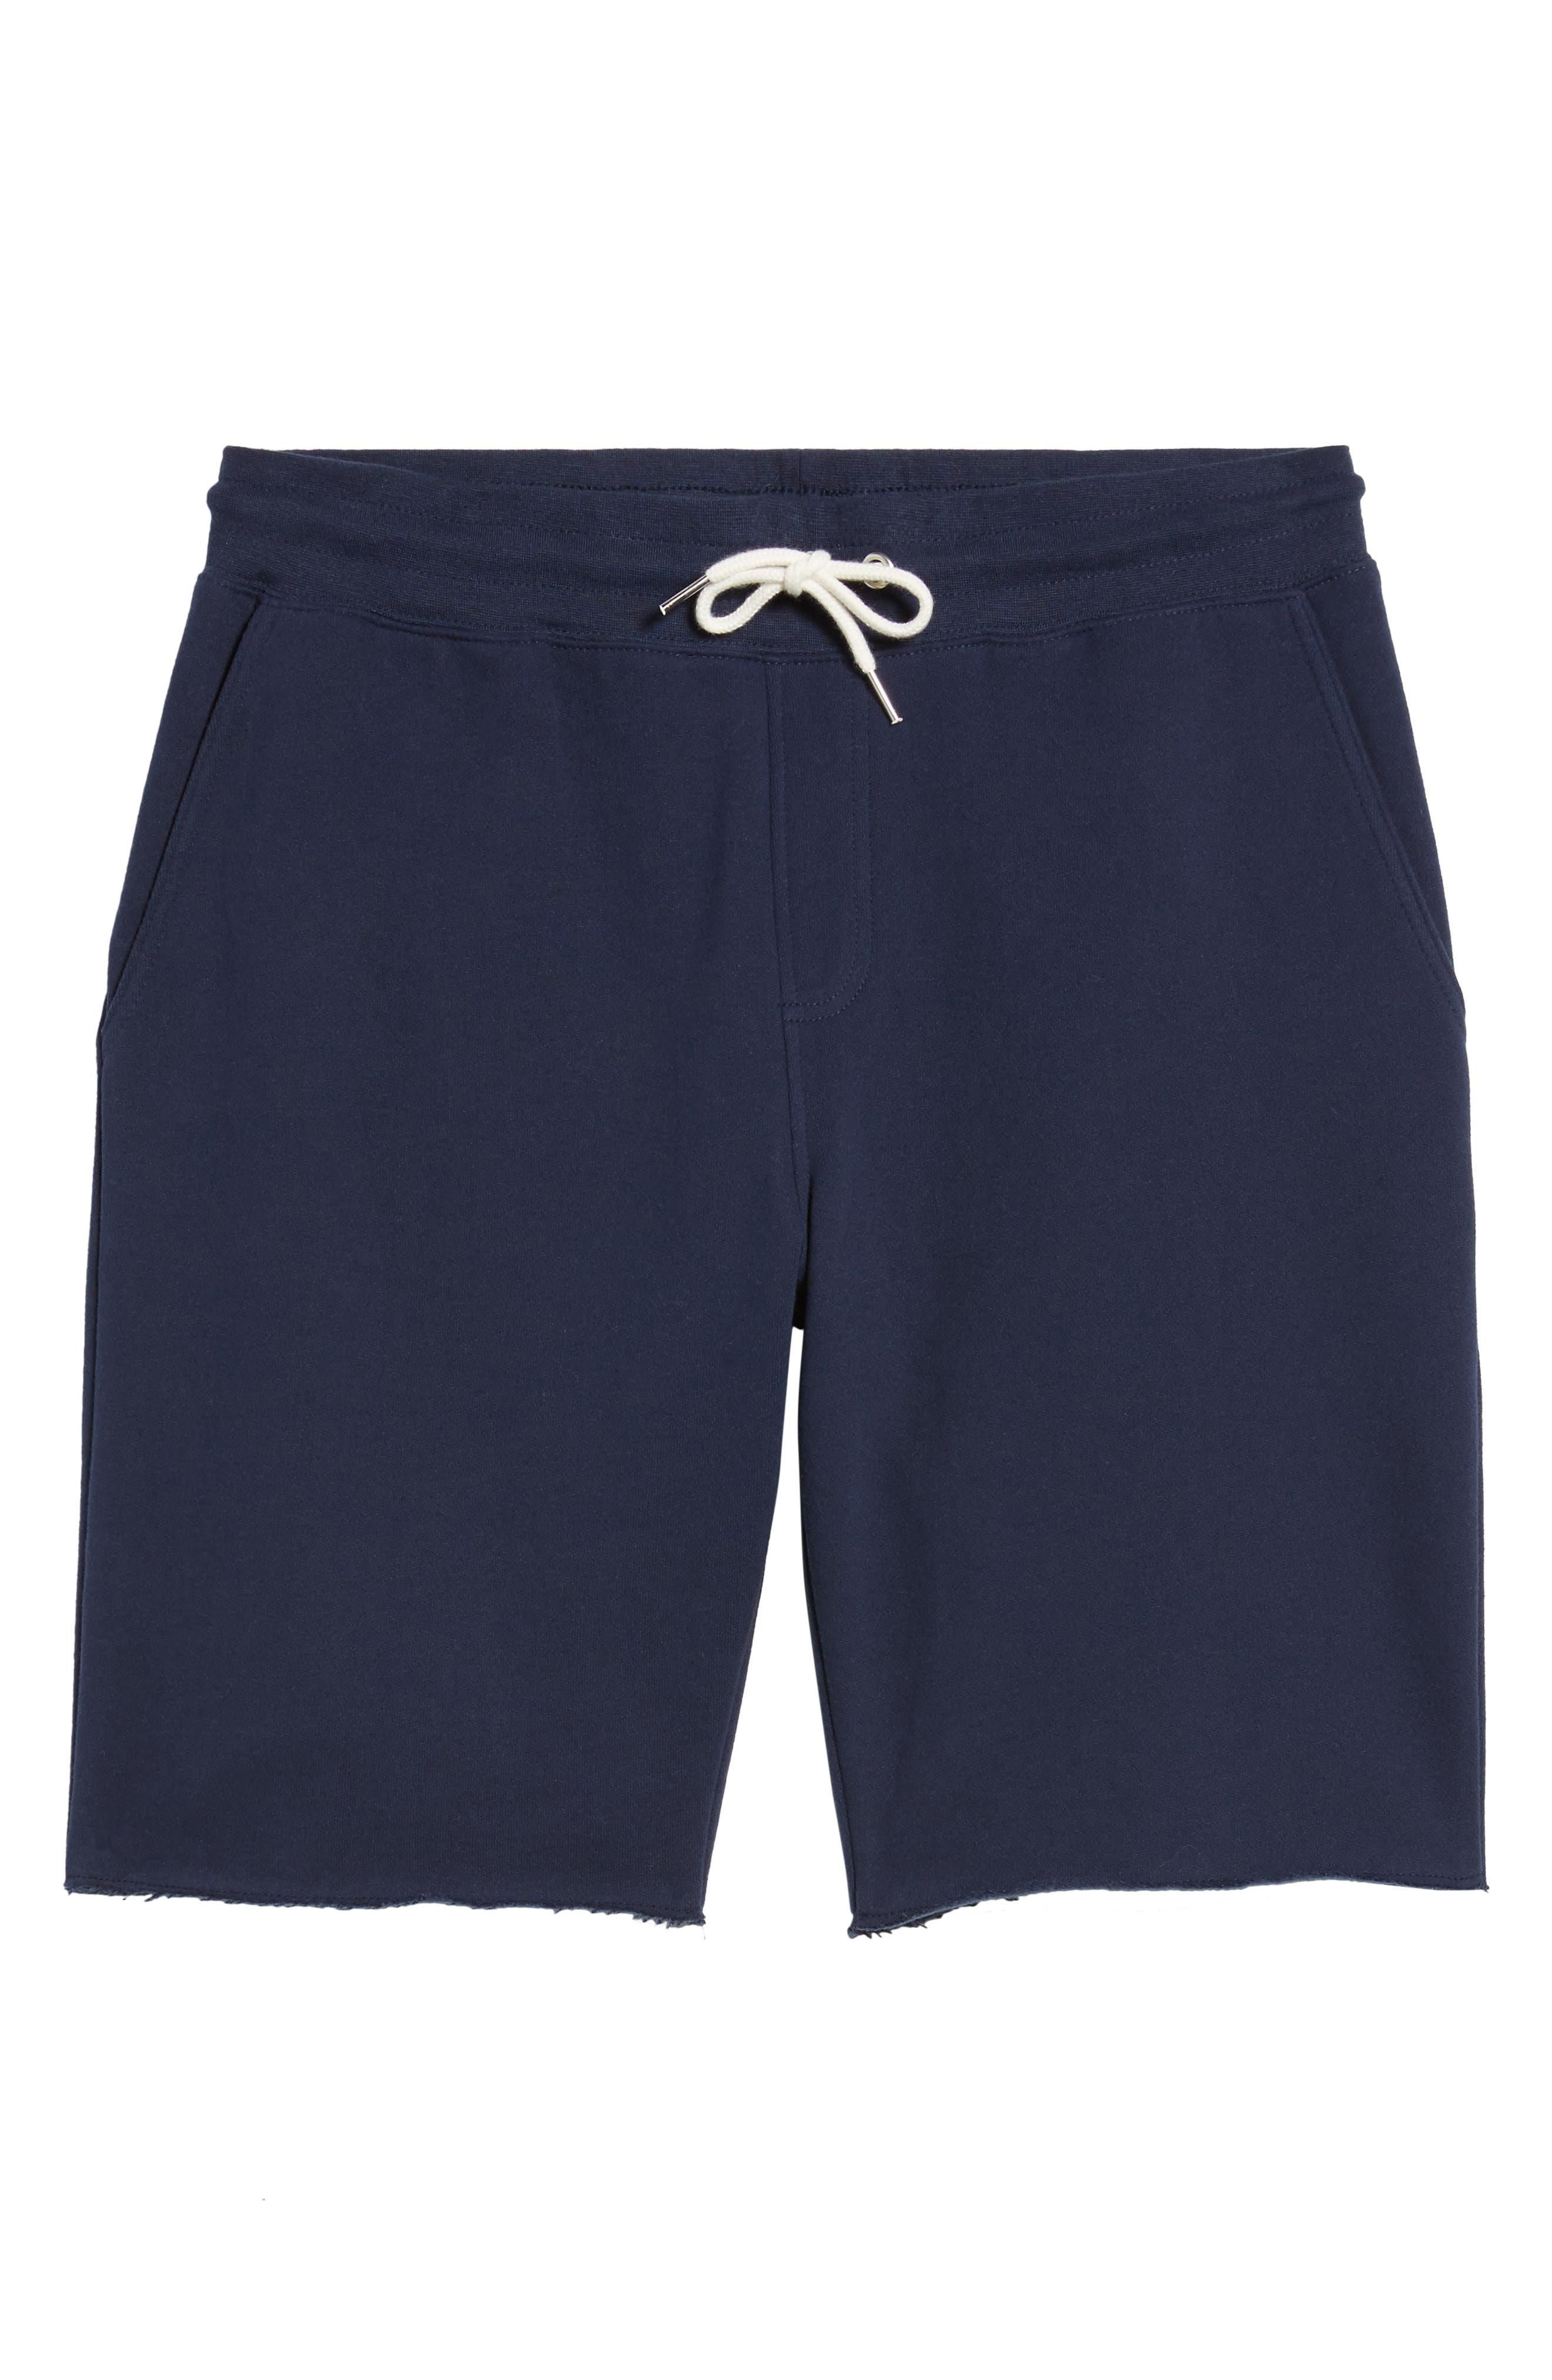 Fleece Shorts,                             Alternate thumbnail 6, color,                             Navy Peacoat